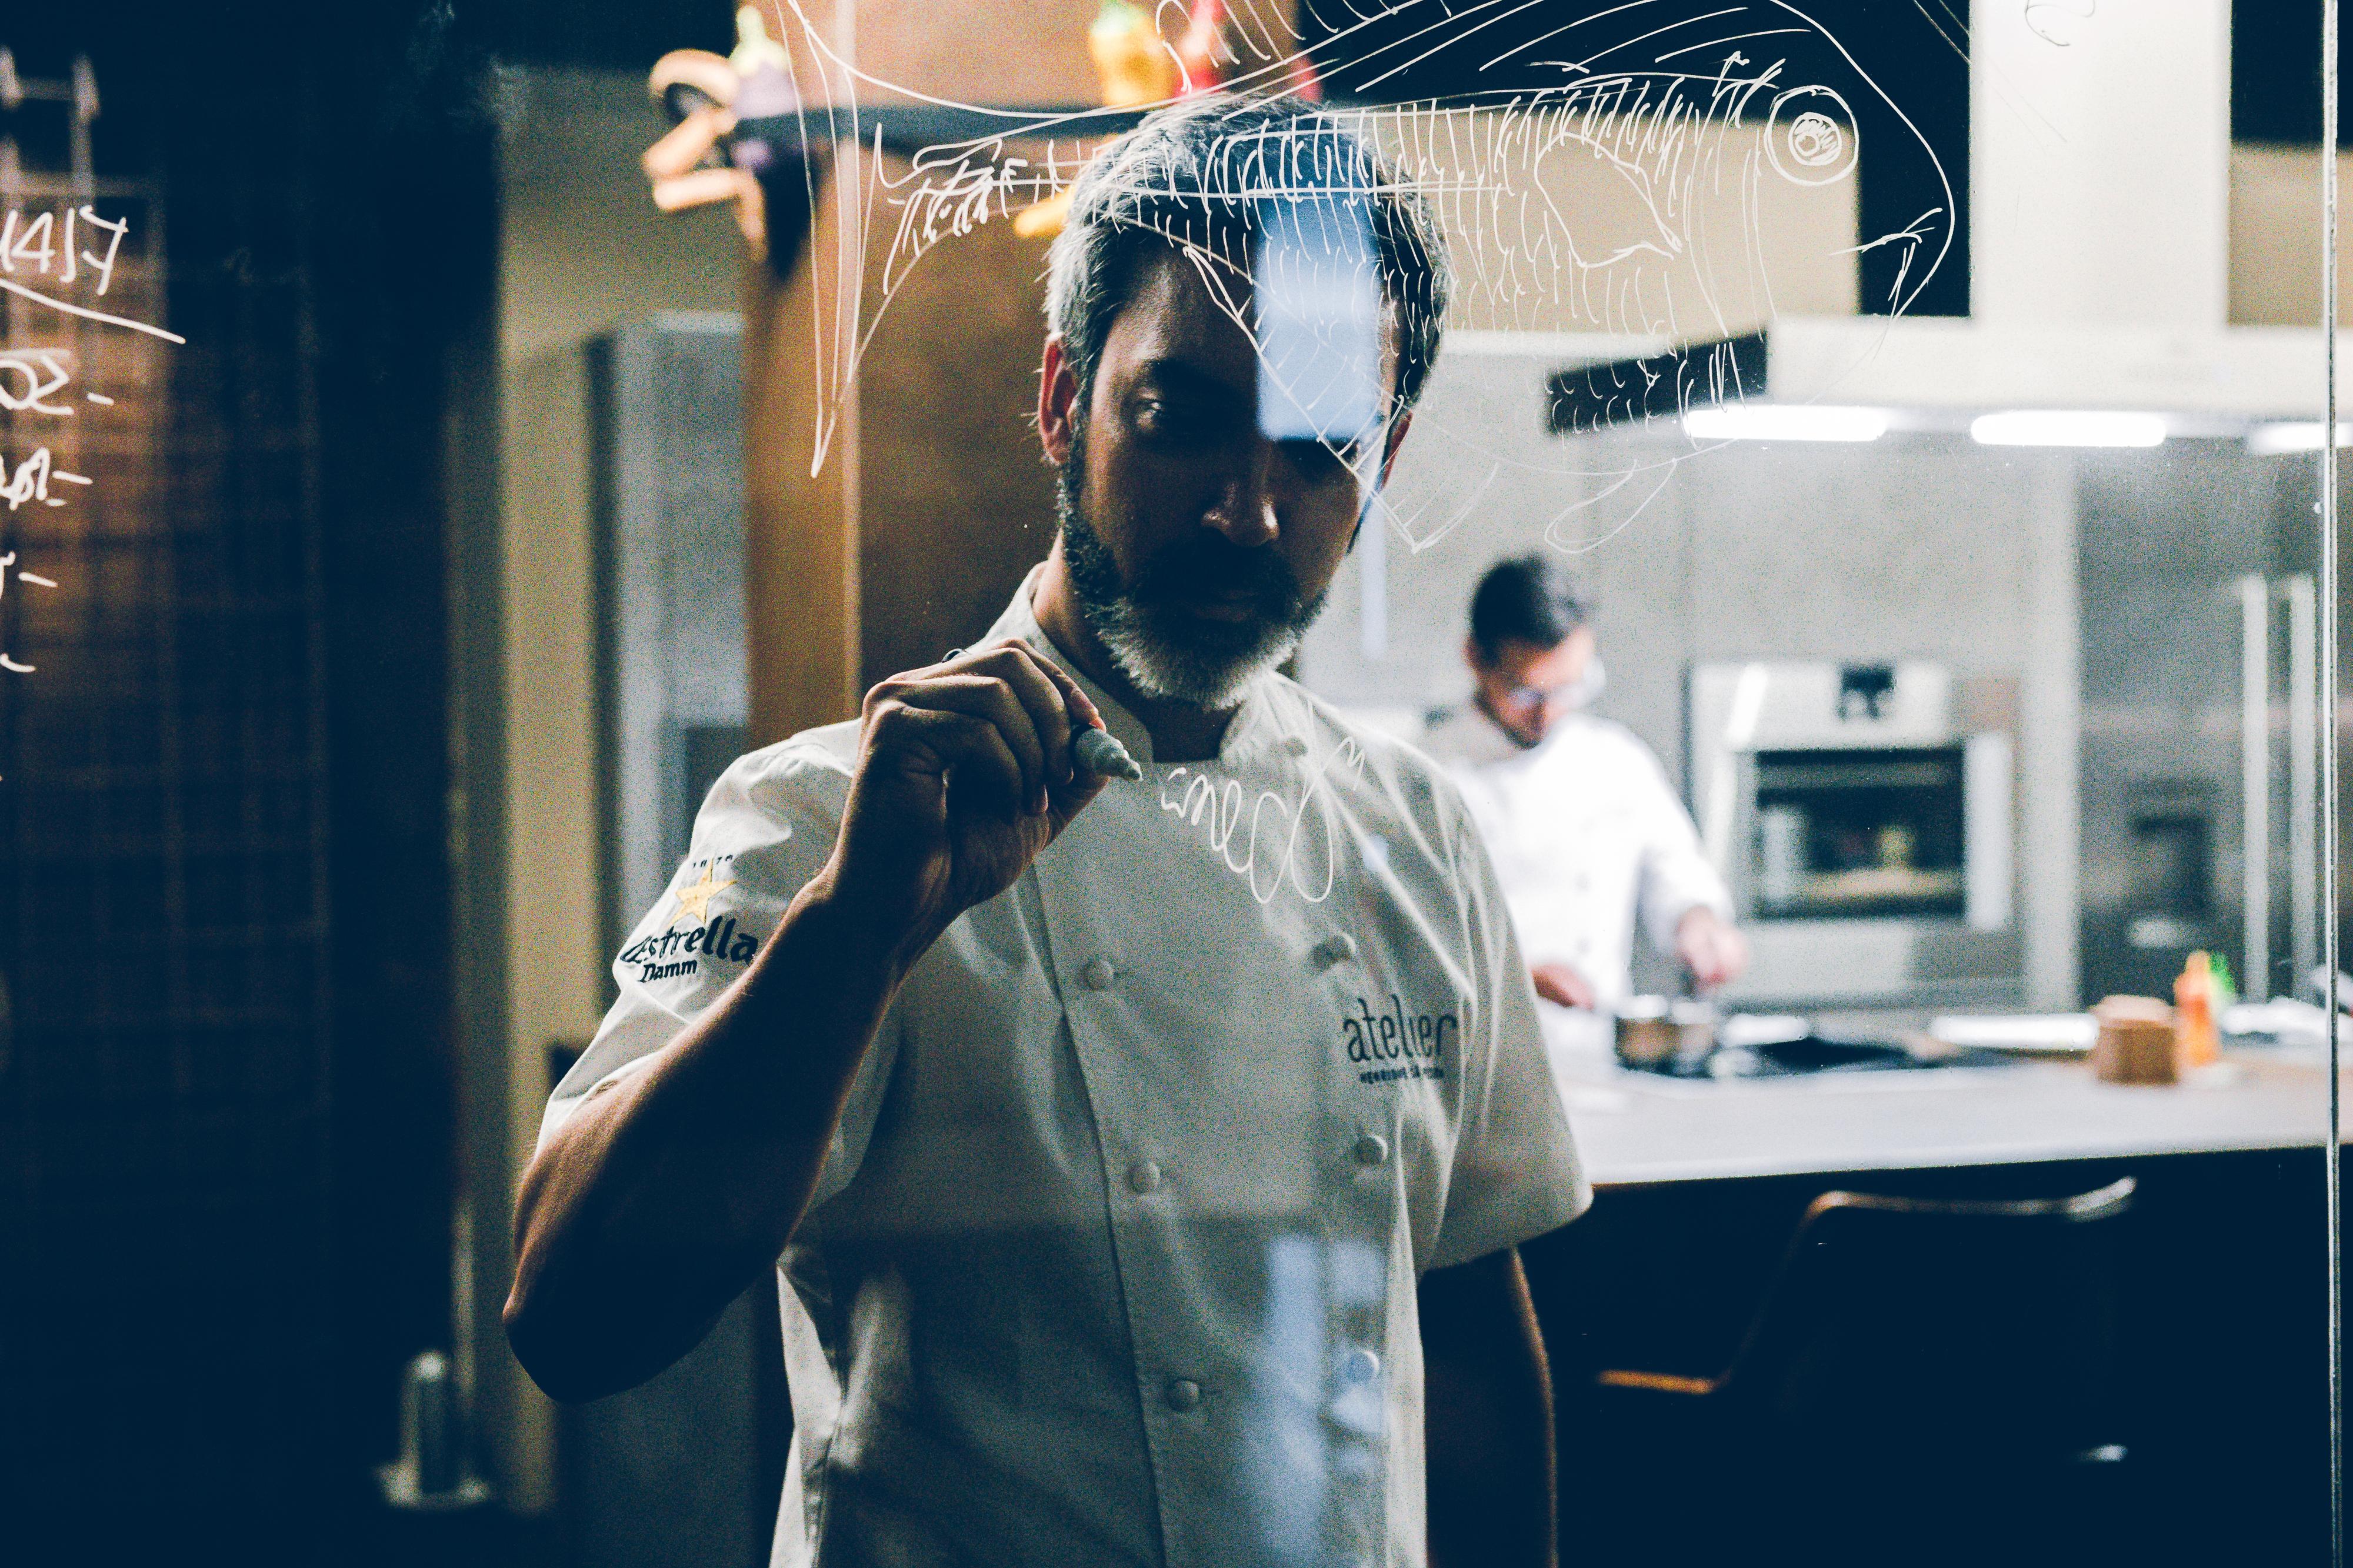 Restaurante Alma, de Sá Pessoa, junta-se a 3 de dezembro a jantar que reúne 138 países